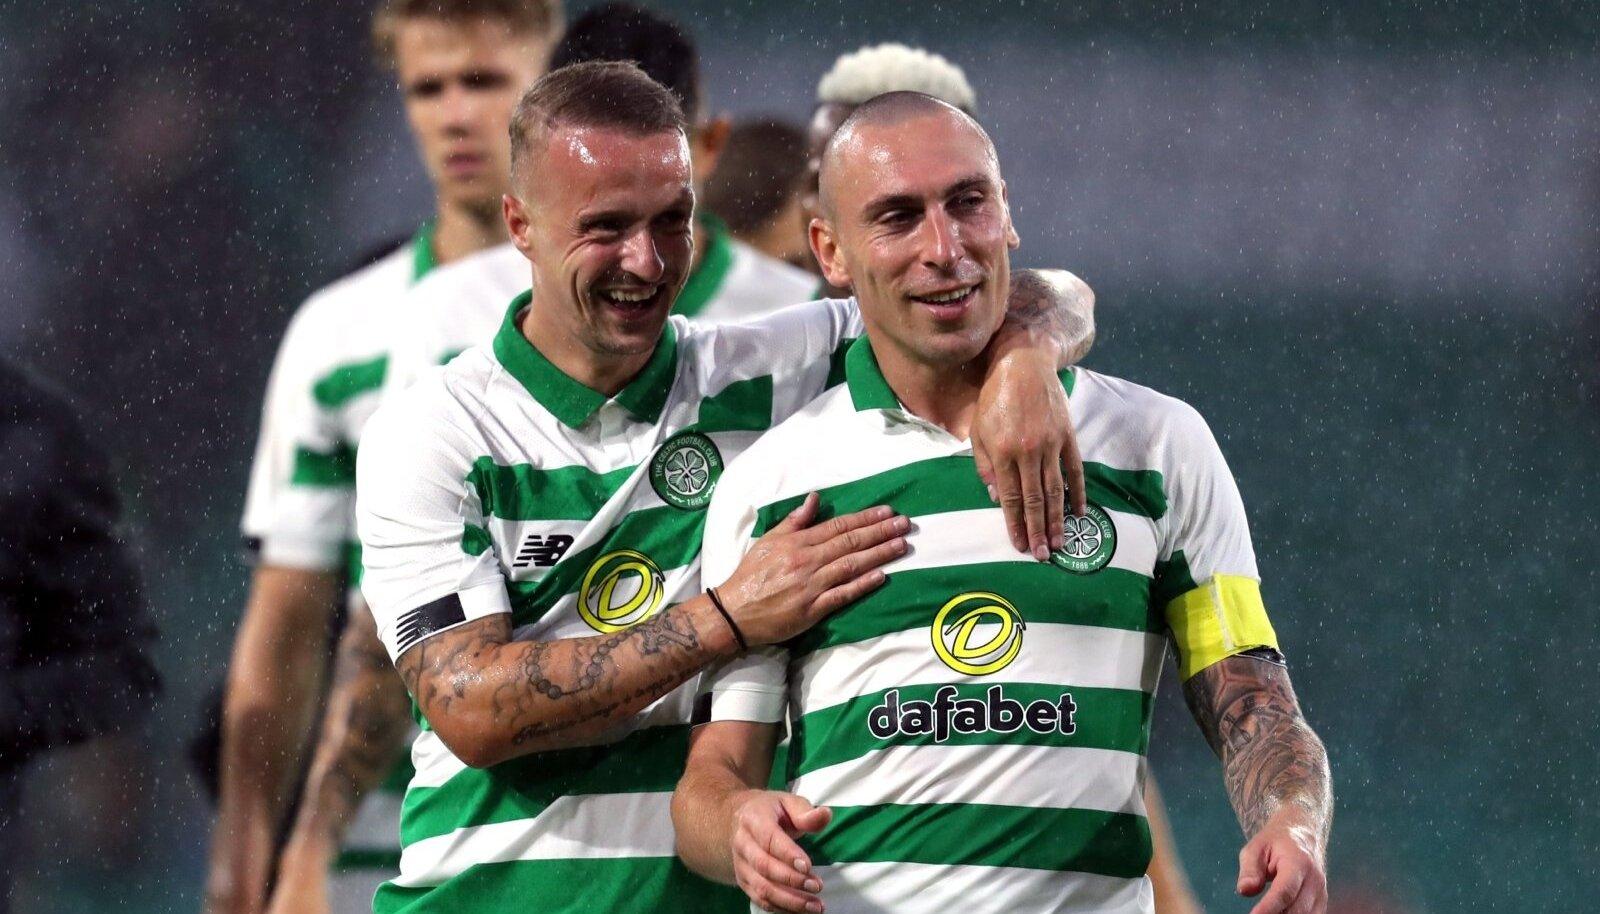 Celtic v FK Sarajevo - UEFA Champions League - First Qualifying Round - Second Leg - Celtic Park